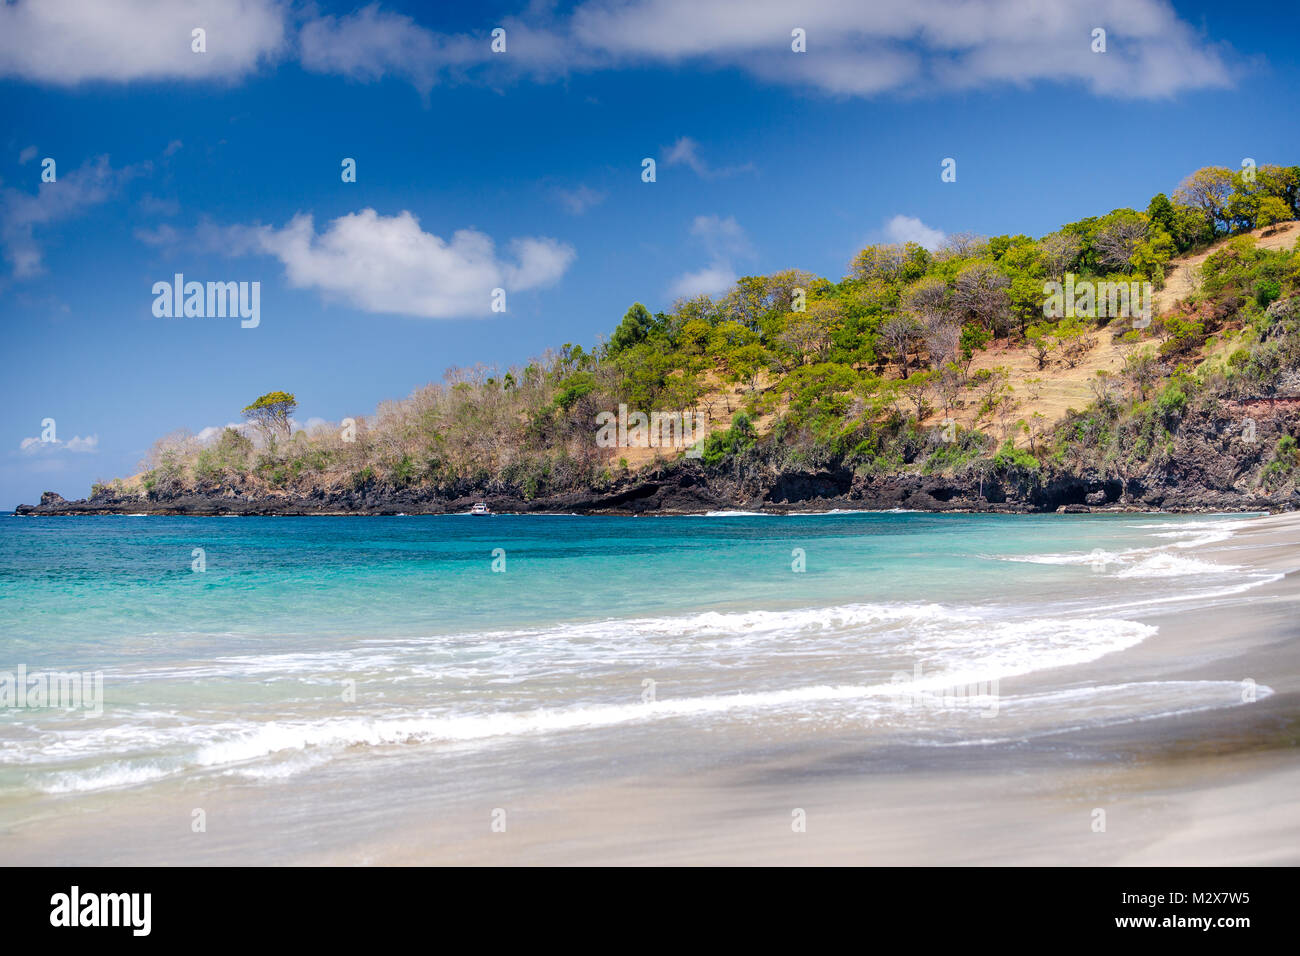 Deserted Bali beach - Bias Tugel Beach Stock Photo